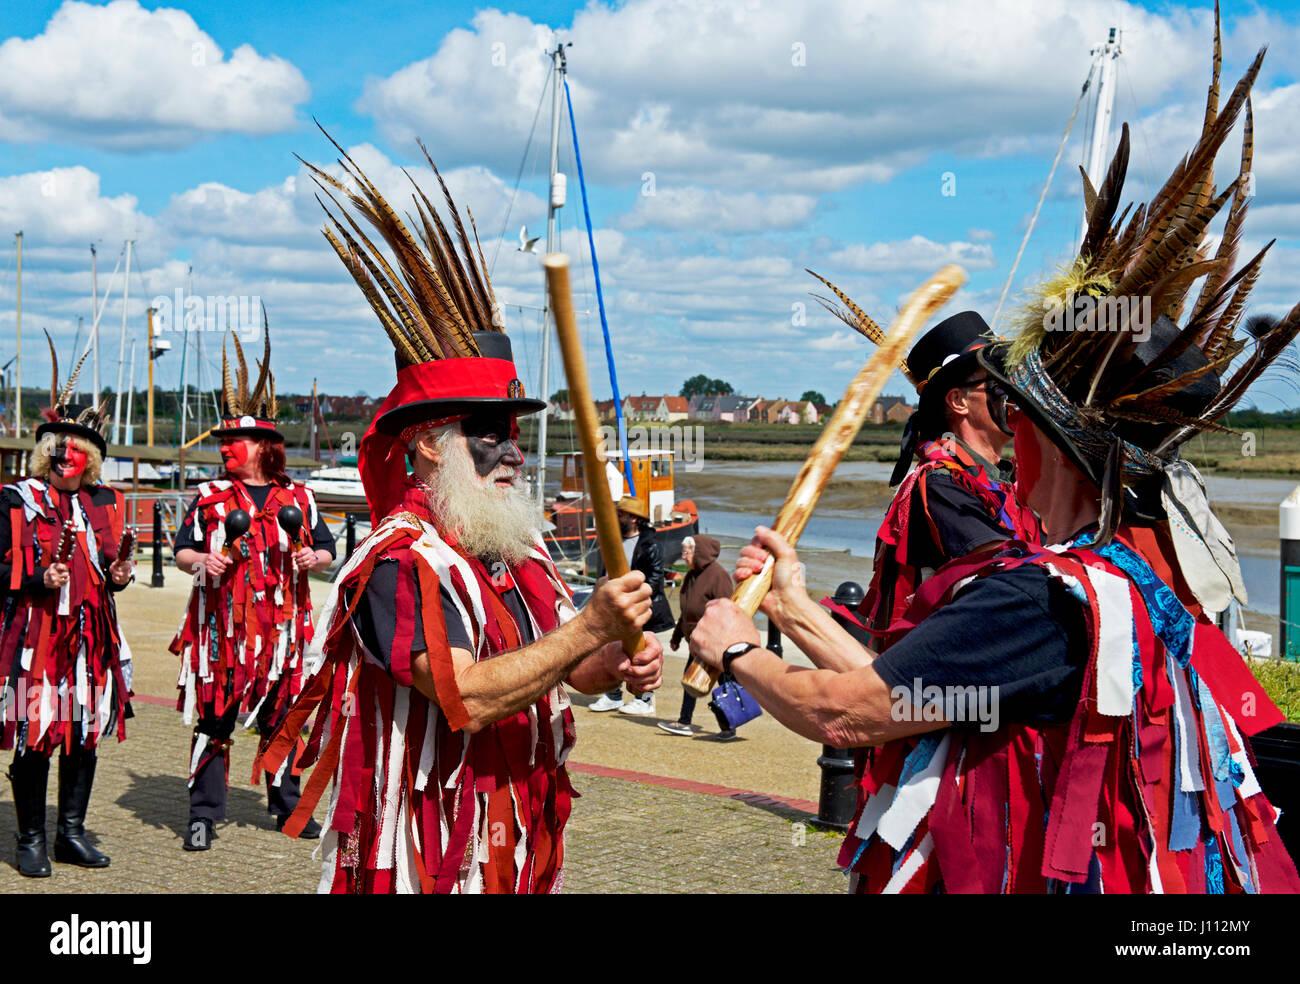 The Dark Horse morris troupe performing in Maldon, Essex. England UK - Stock Image